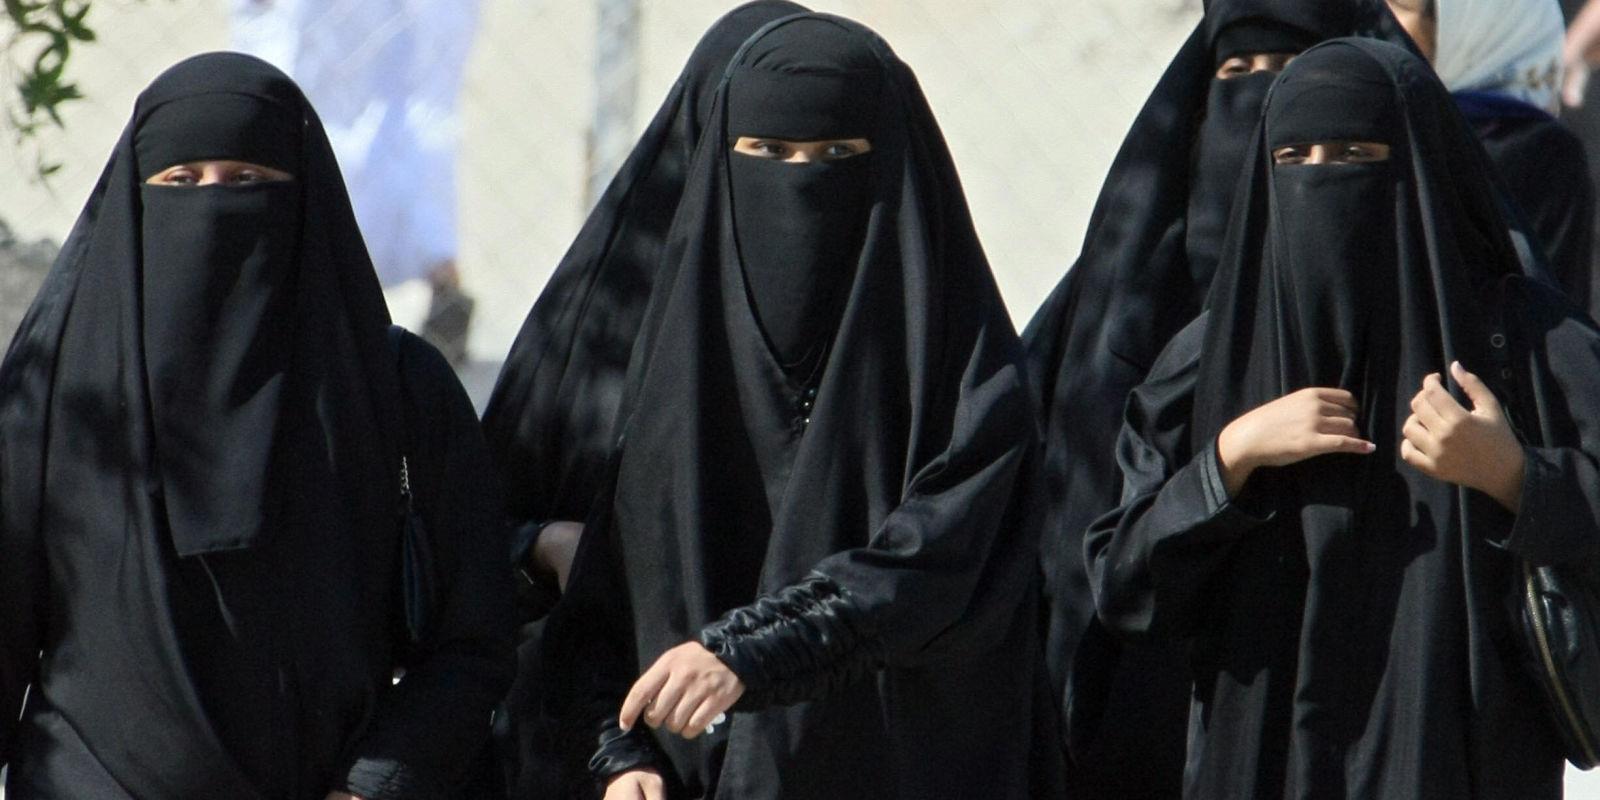 women burkas the Muslim at beach in